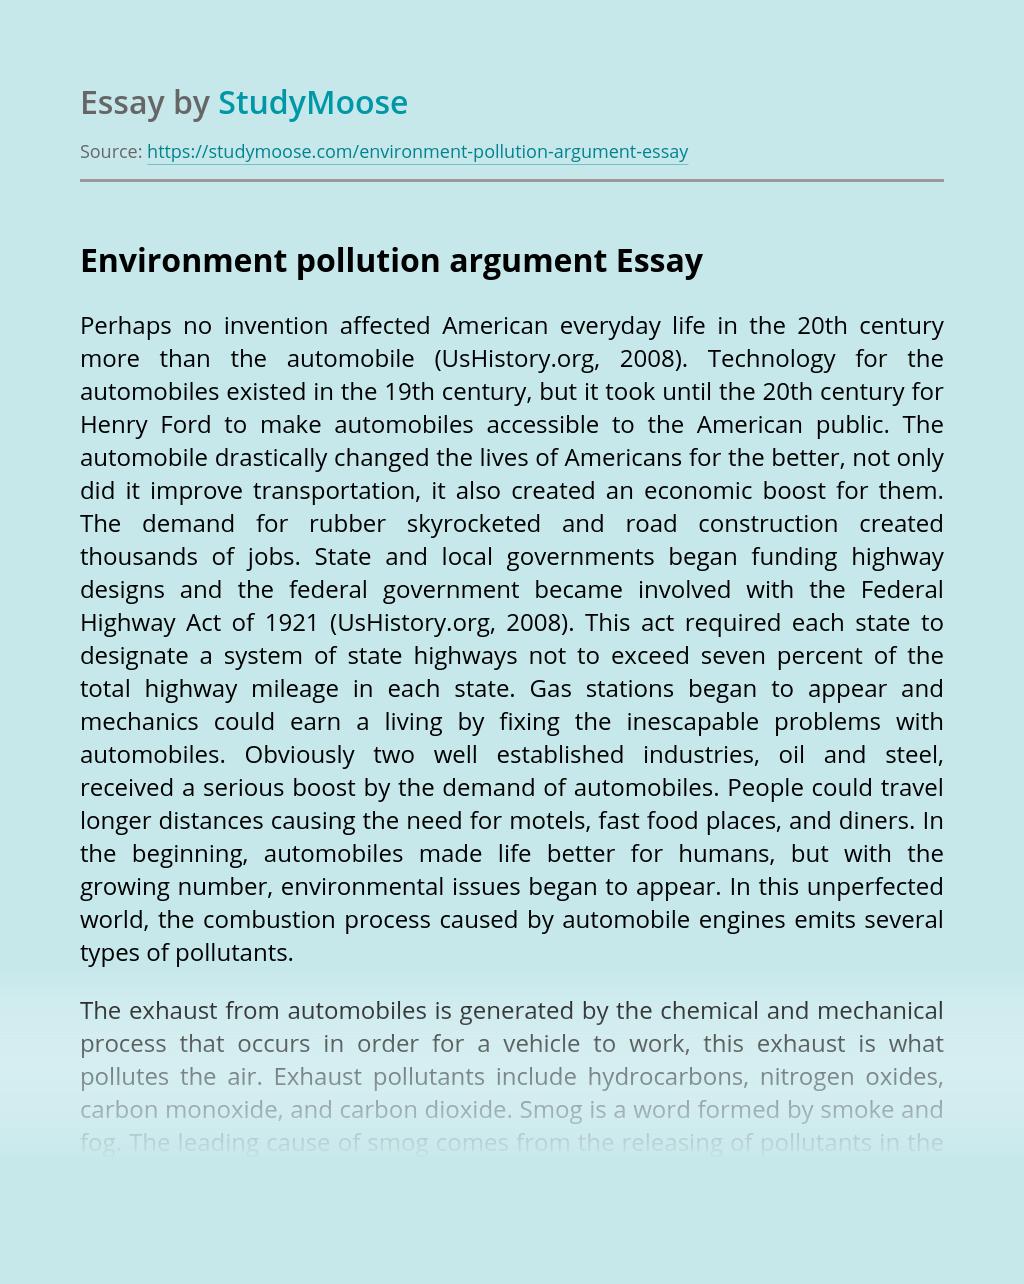 Environment pollution argument